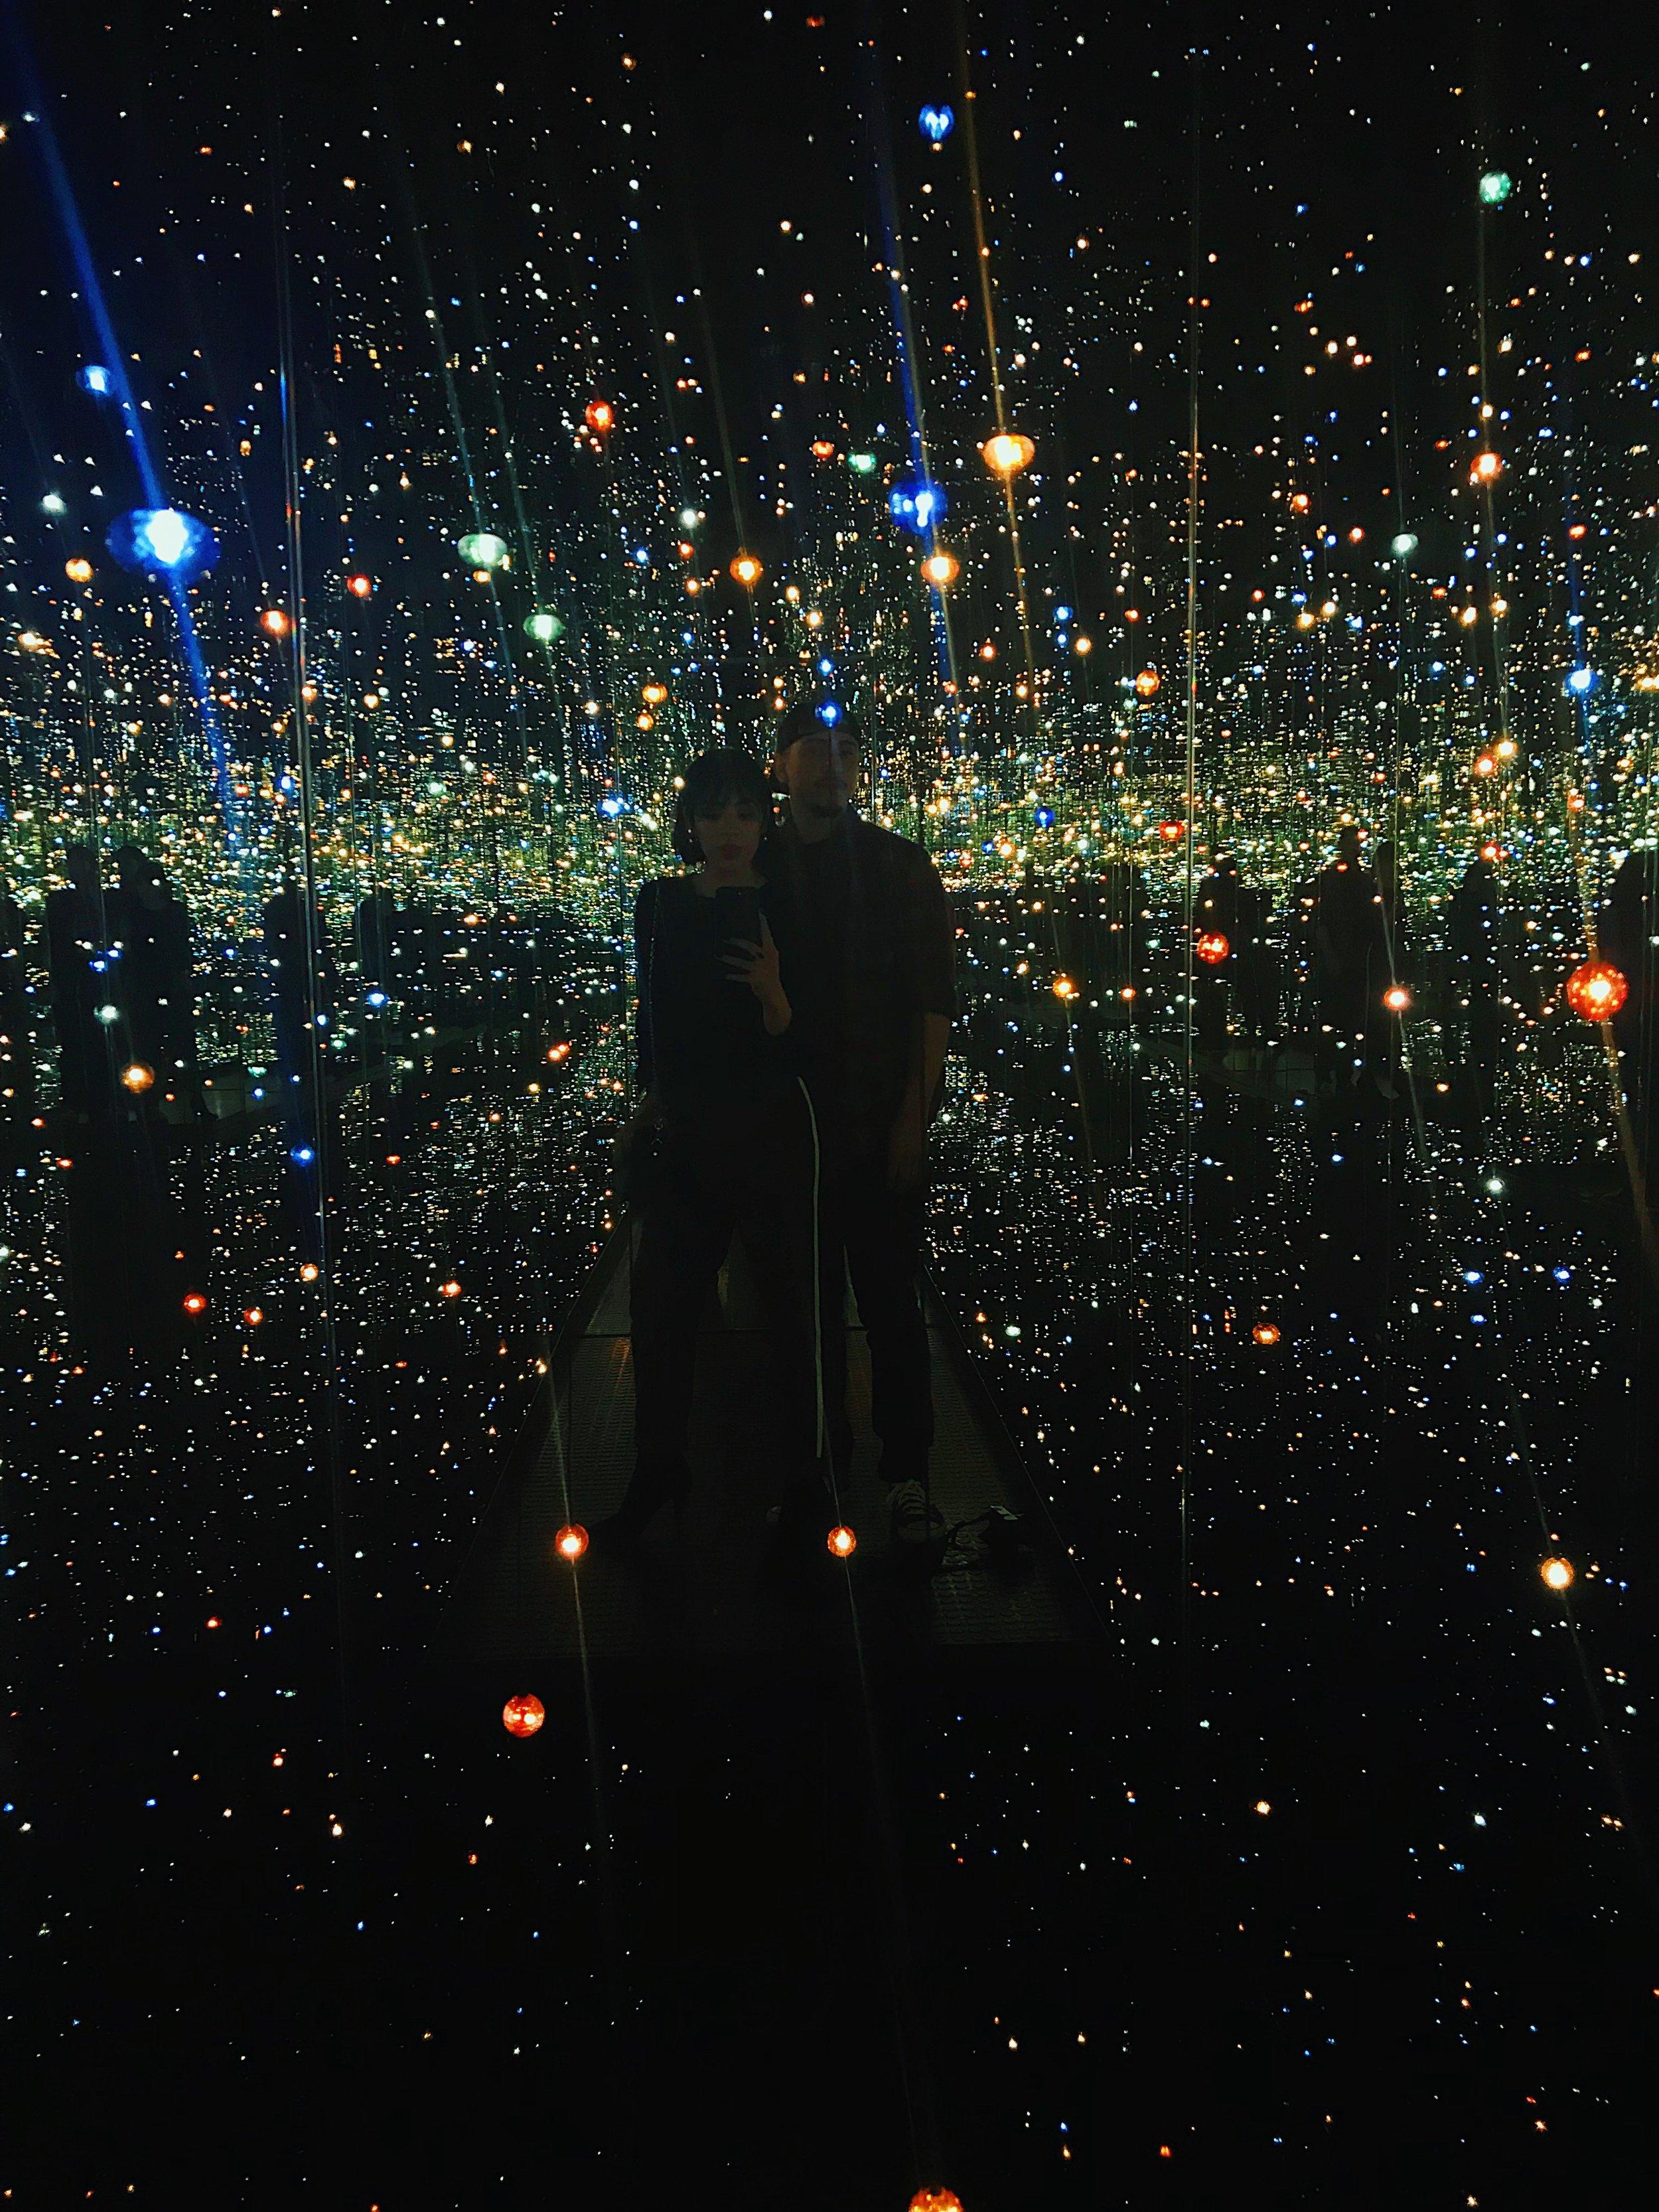 - Infinity Mirrored Rooms by Yayoi Kusama, The Broad